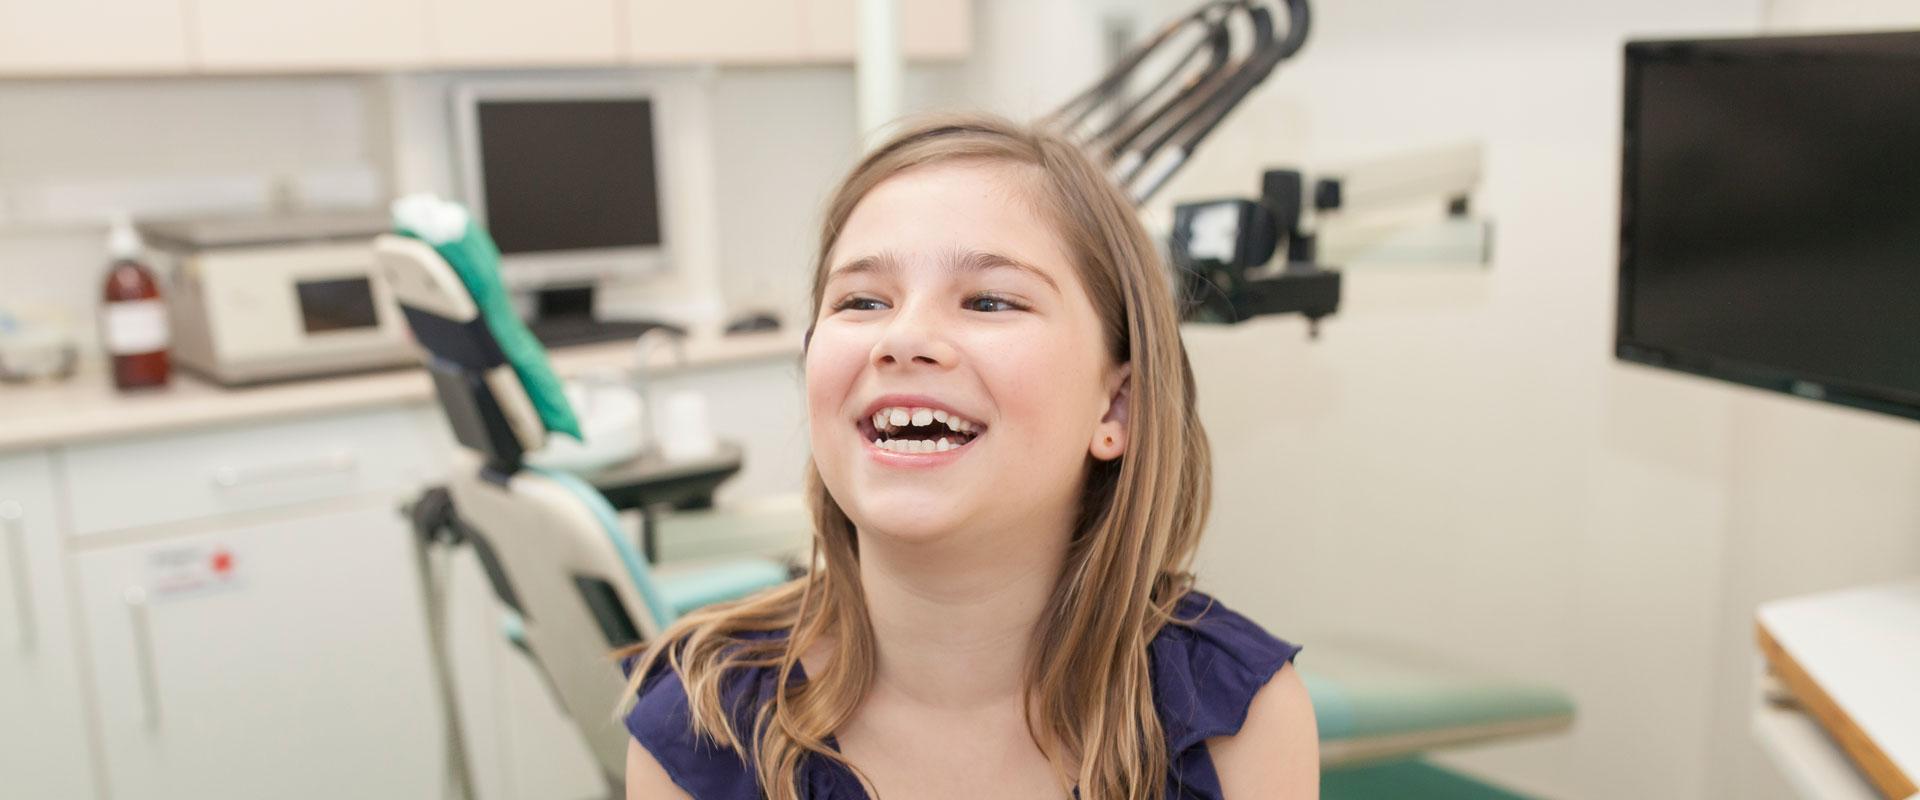 Odontopediataría dentista familia ninos-Barcelona-Clinica-Dental-Murtra